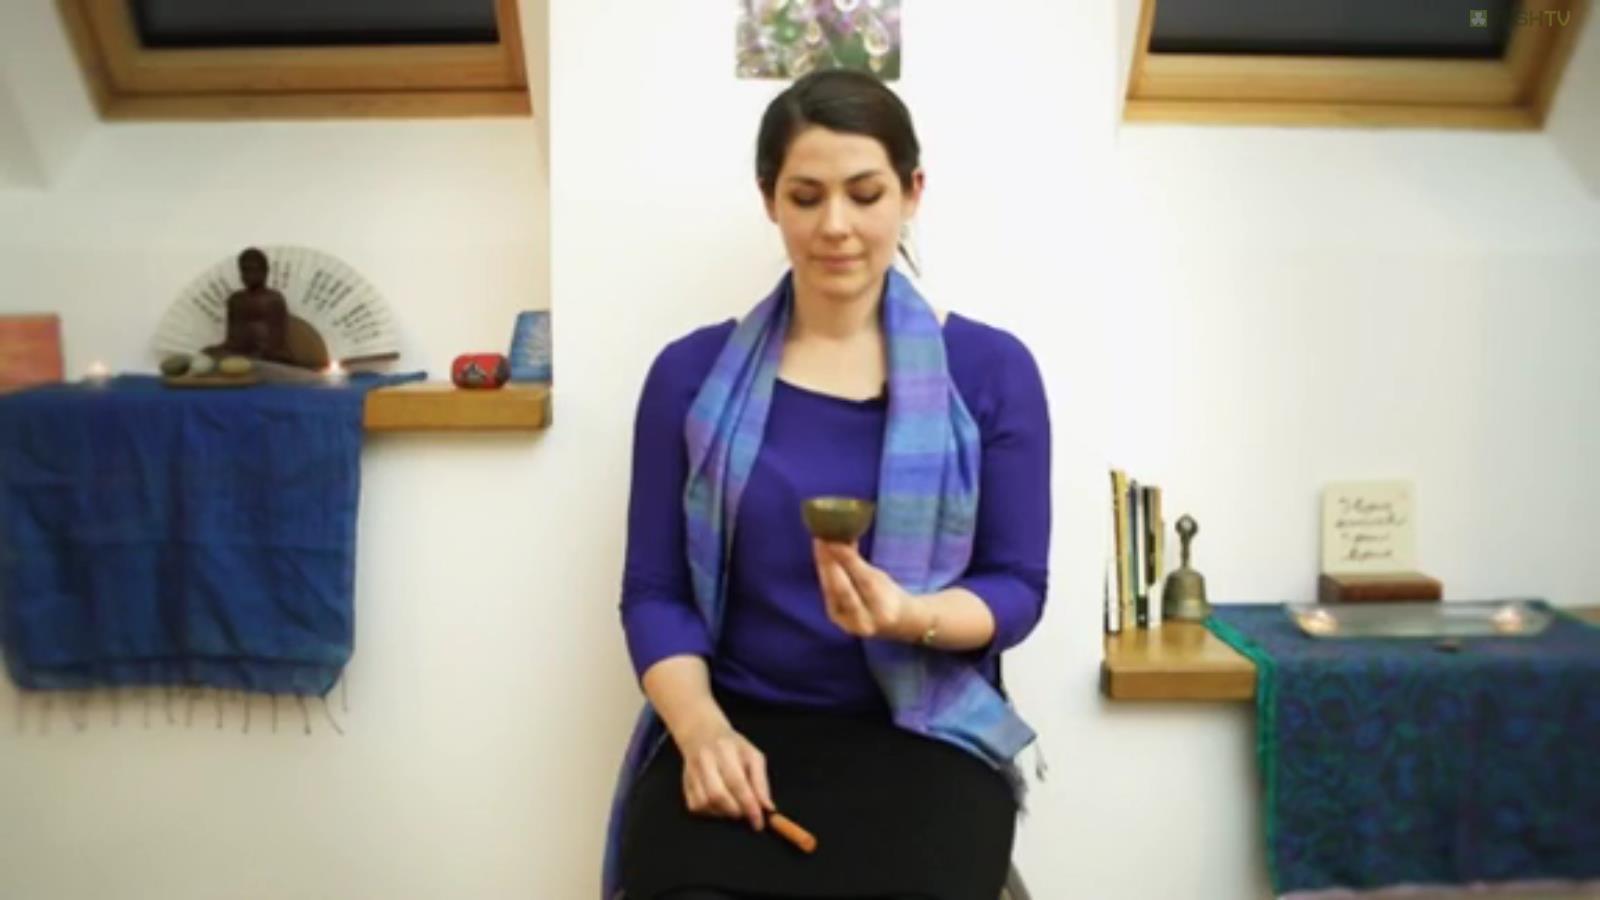 Blue Heron Mindfulness in the media: Irish TV